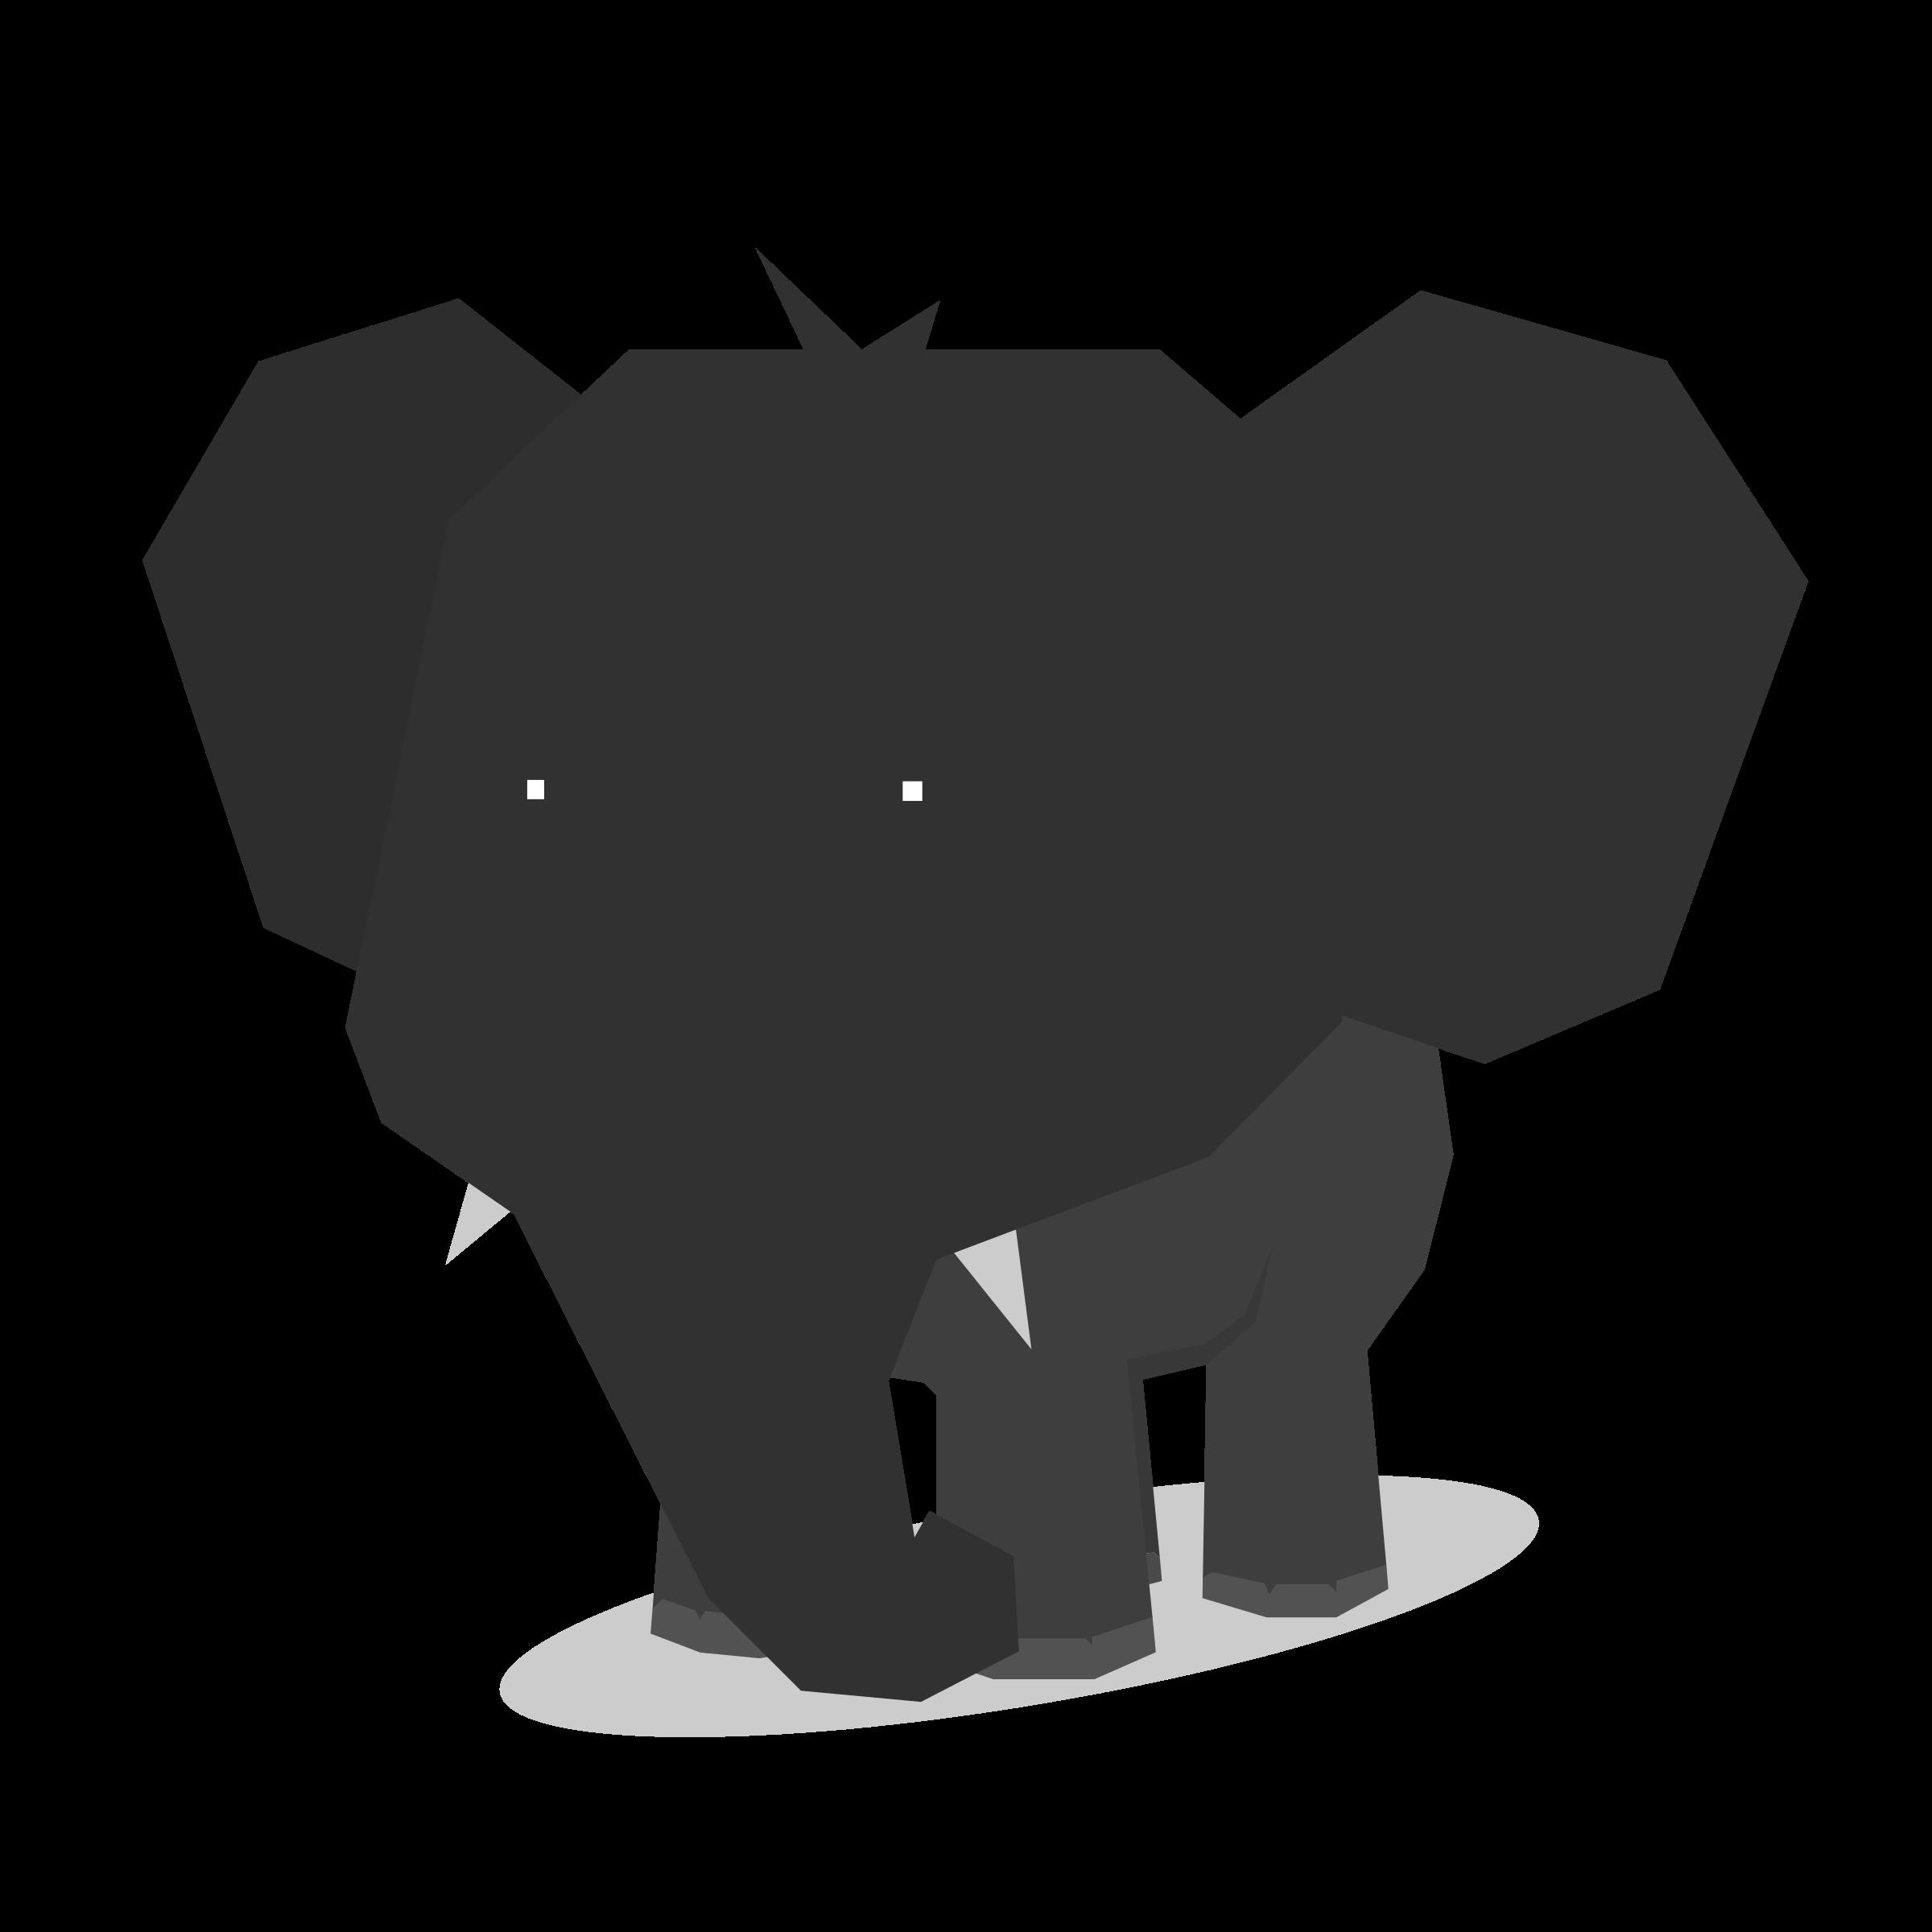 Polygon Elephant Vector file image - Free stock photo ...